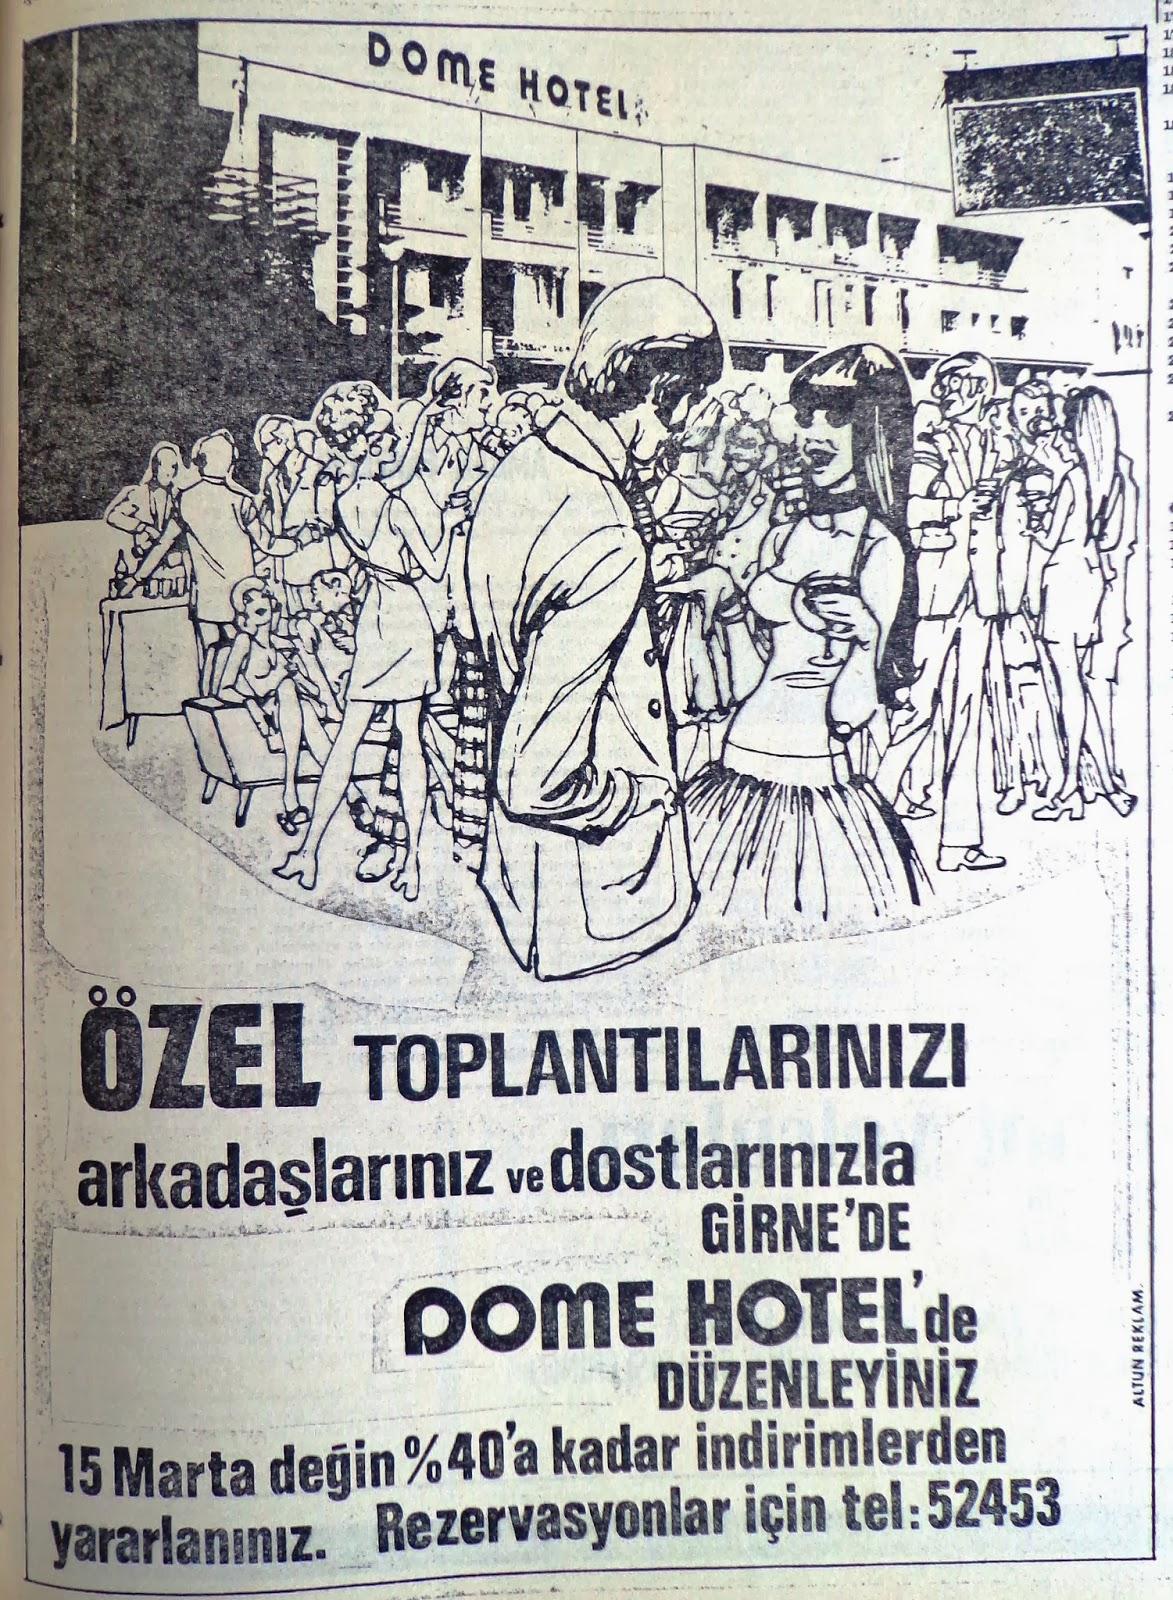 http://4.bp.blogspot.com/-ZnupyyM7laE/UtJgYTiIpuI/AAAAAAAAApo/NDPI_WG0z80/s1600/15+%C5%9Eubat+1976+Halk%C4%B1n+Sesi+Gazetesi'ndeki+Dome+Hotel+%C4%B0lan%C4%B1.JPG